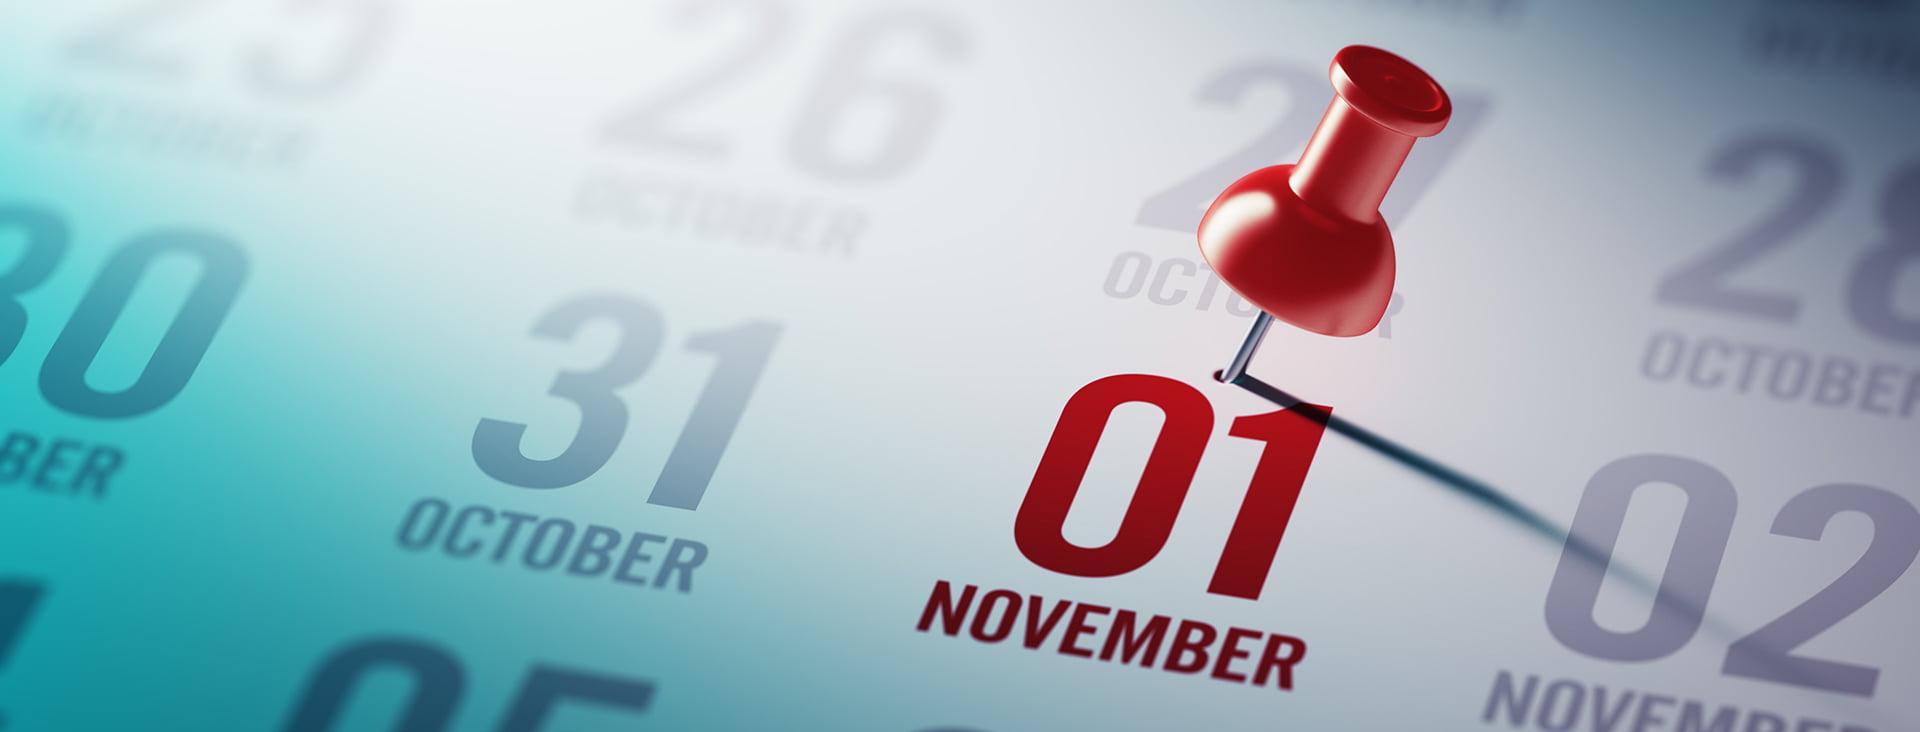 November 1 due date